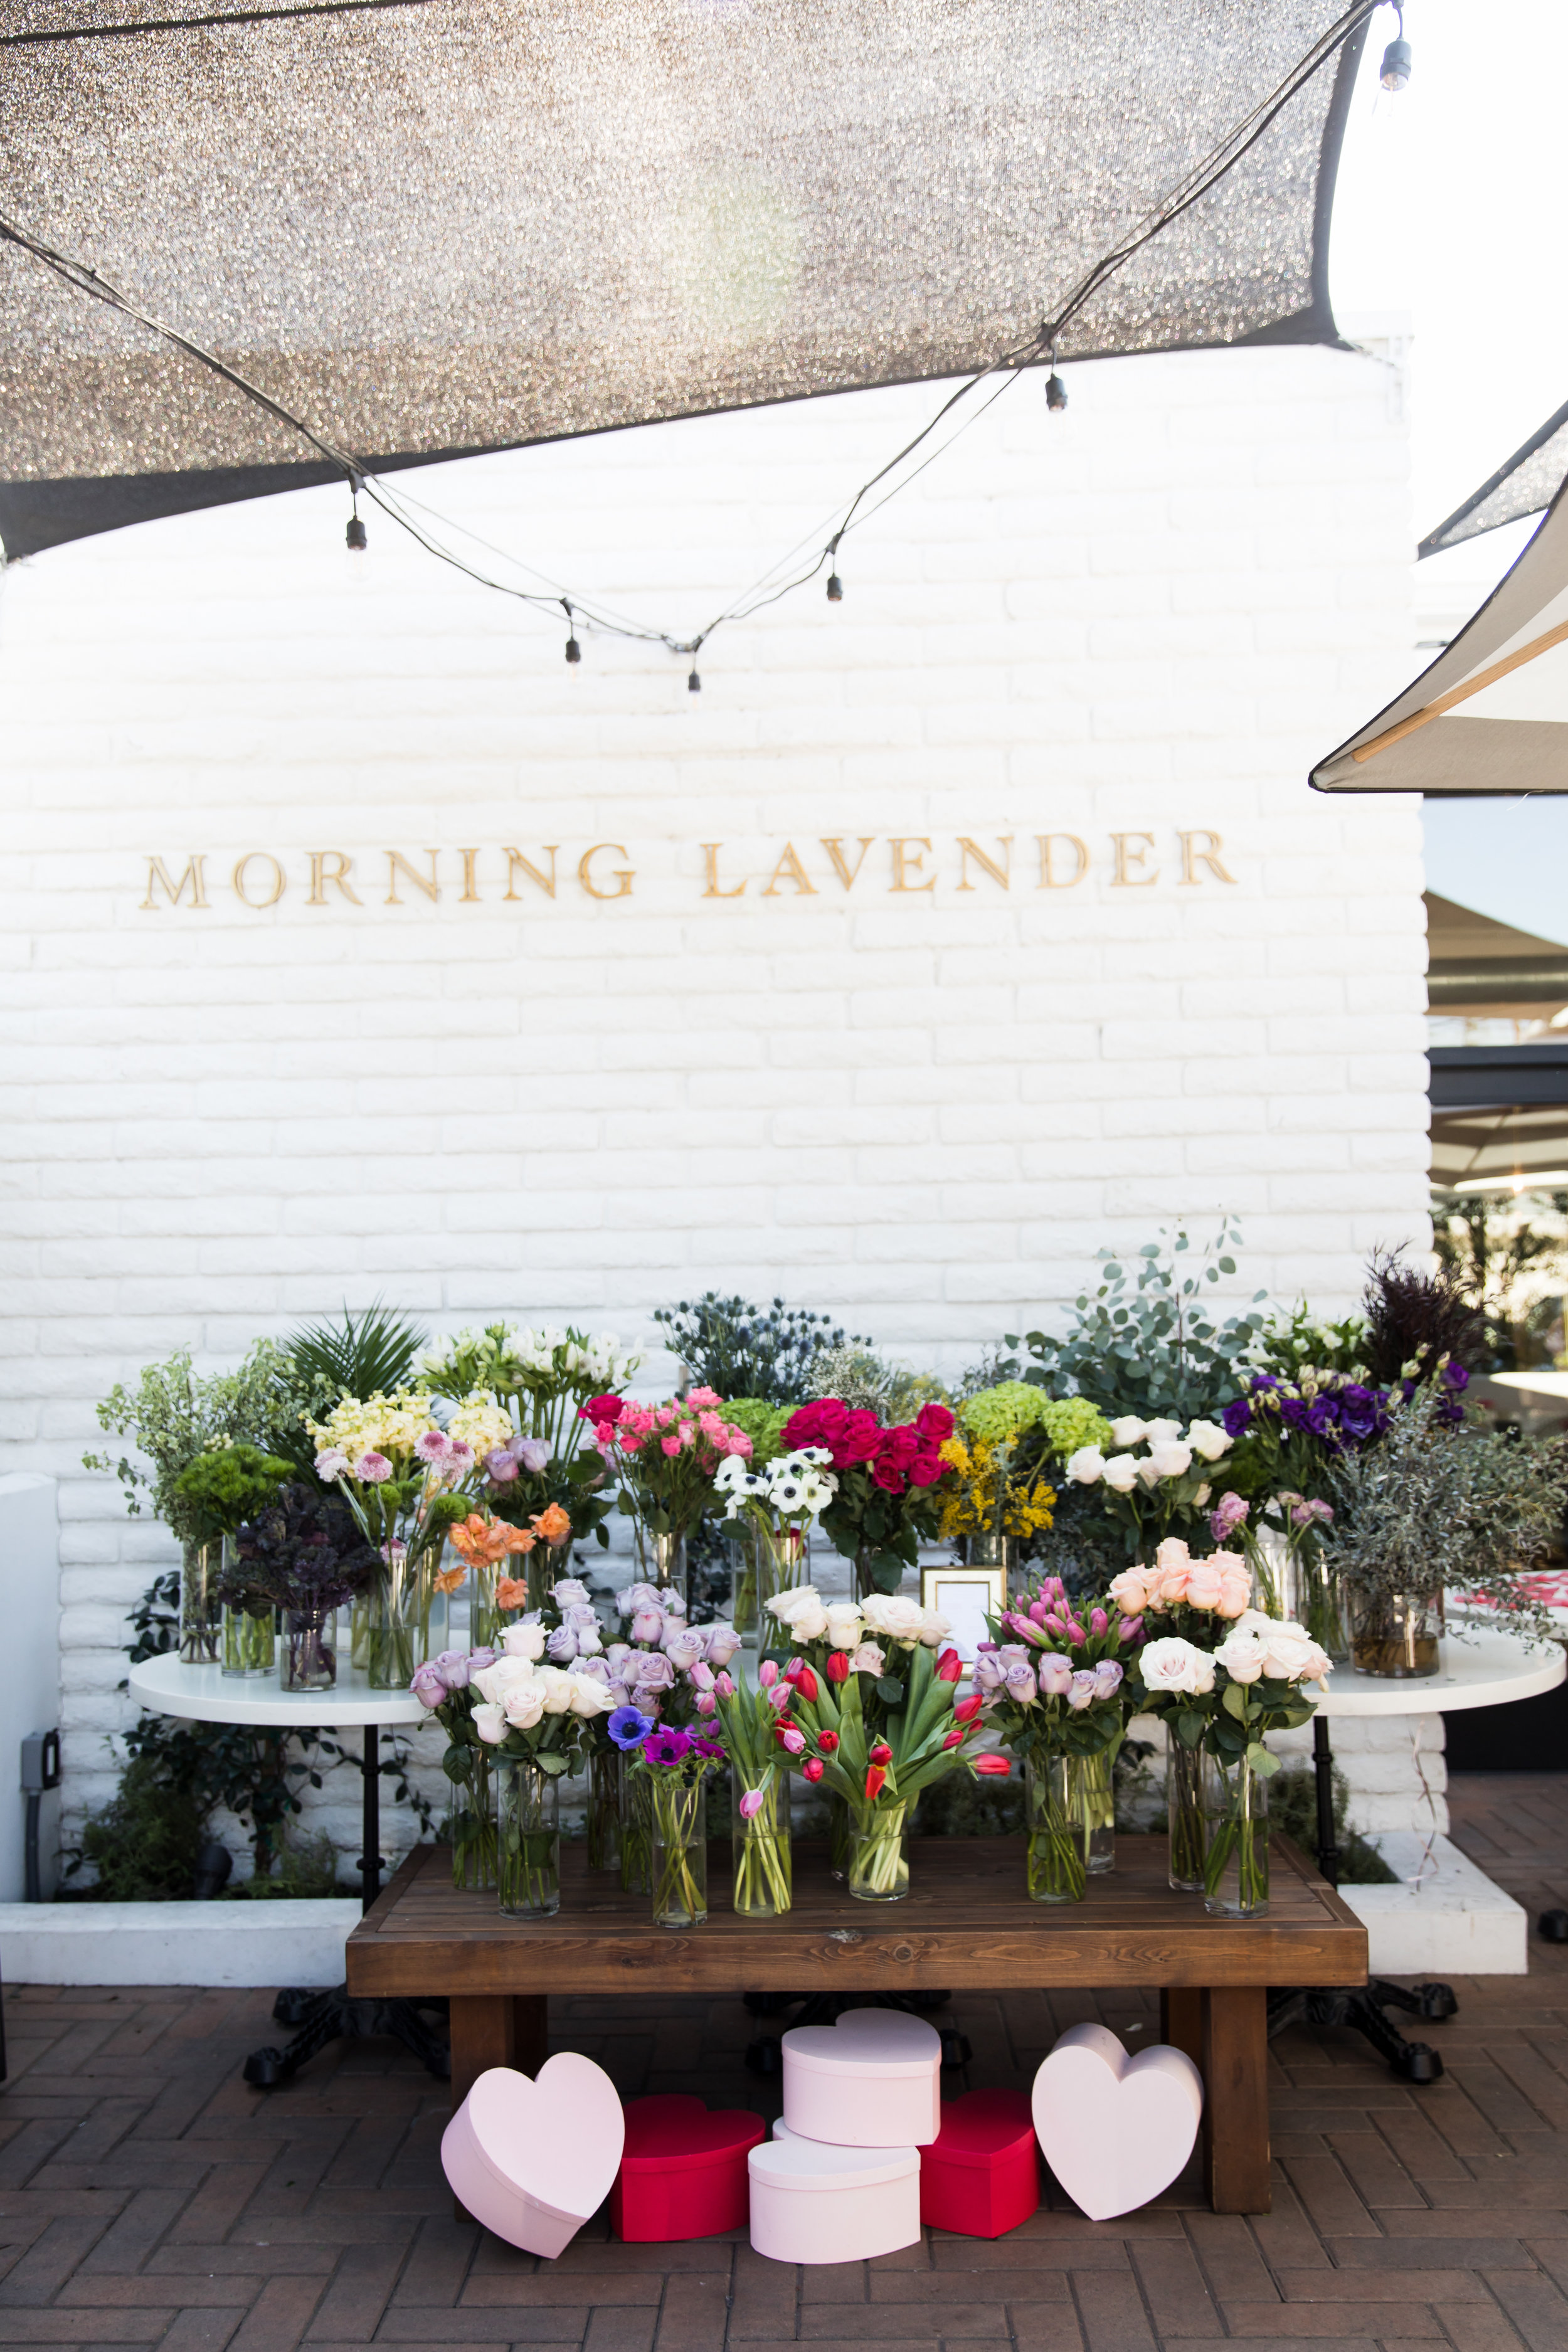 Morning Lavender Galentines 2019 - 008.jpg